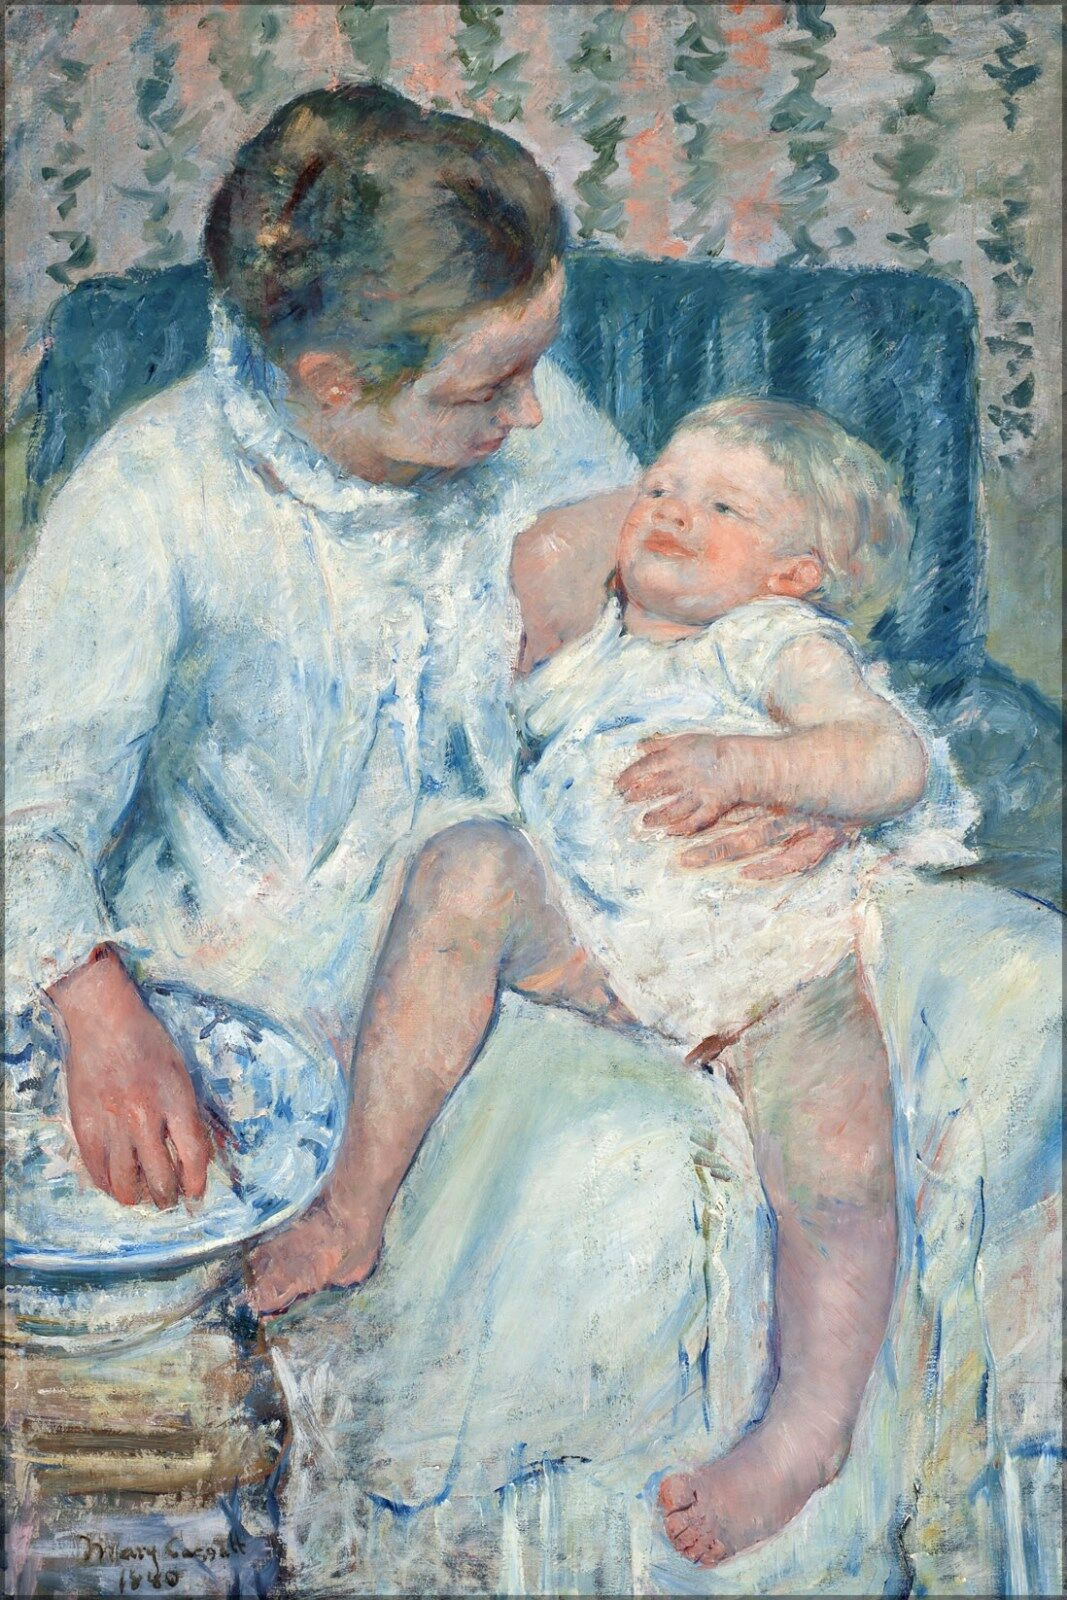 Poster, Molte Misure; Mary Cassatt Mother About per Lavare Lavare Lavare Lei Assonnato baba6c